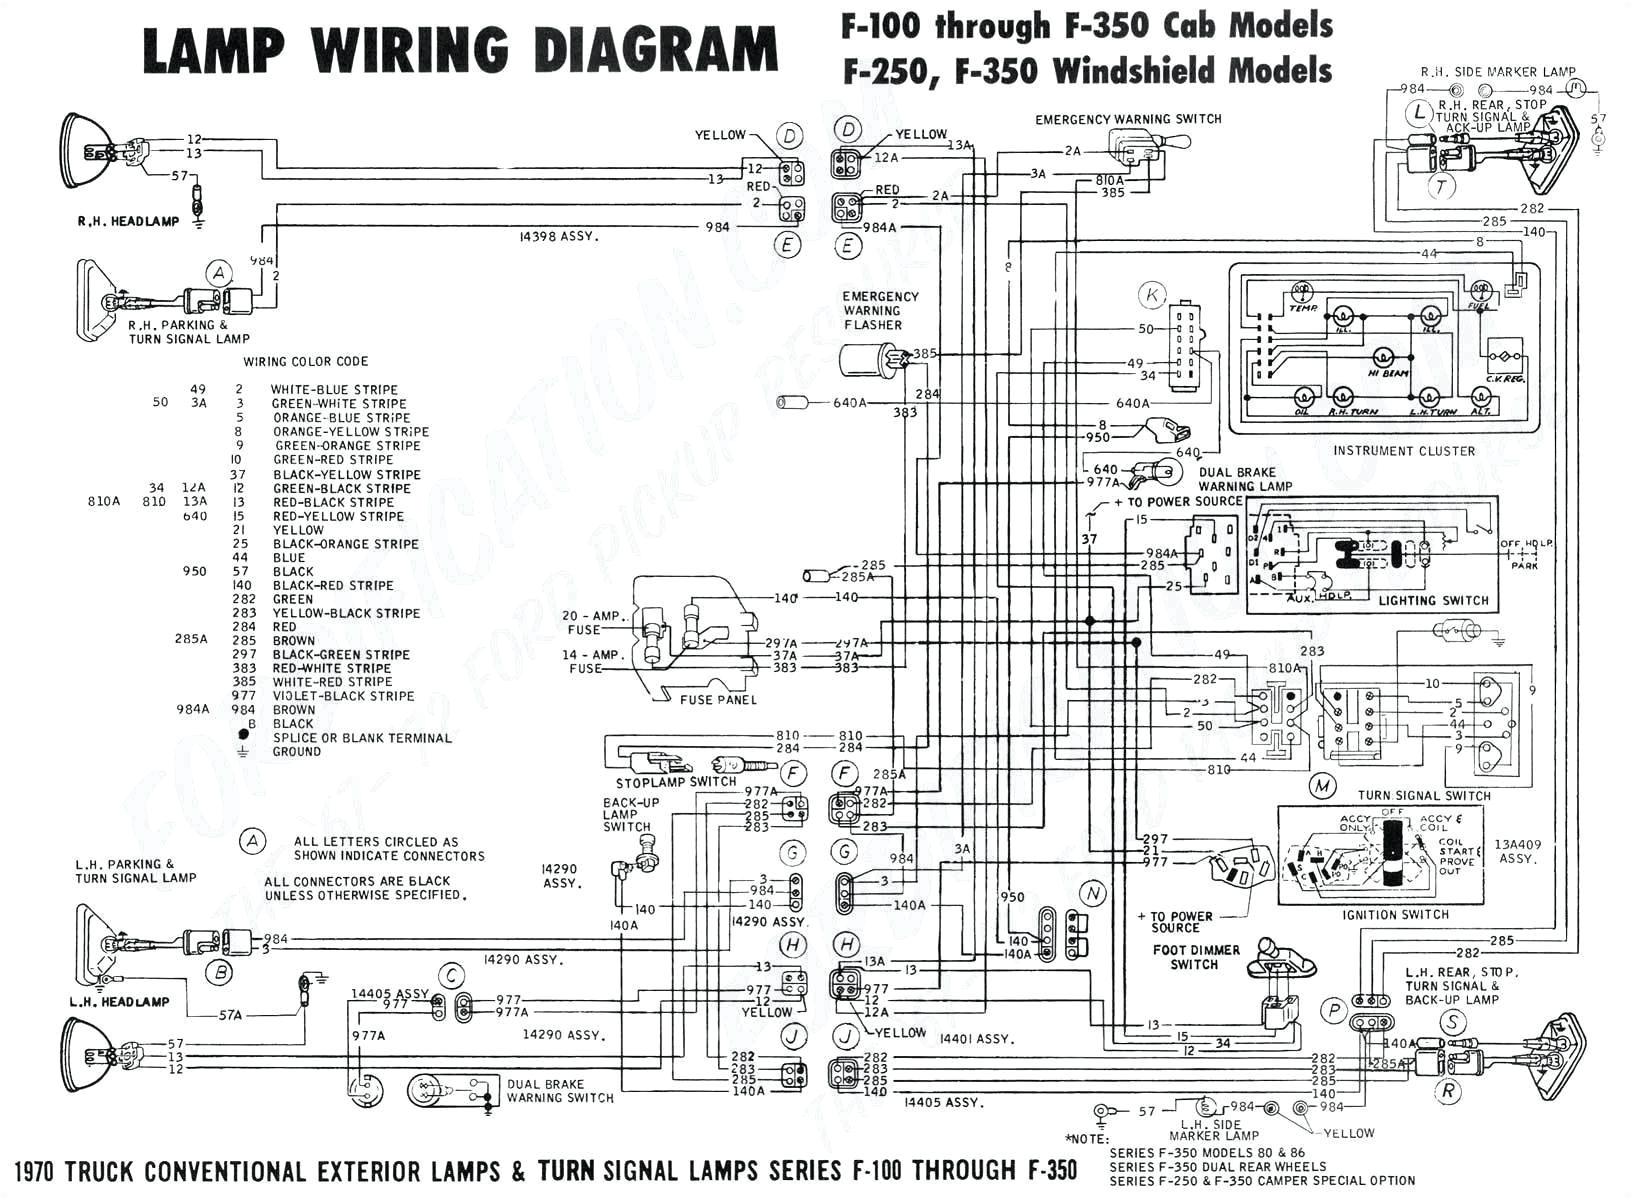 1991 nissan pickup headlight wiring diagram wire diagram database toyota 1991 headlight wiring